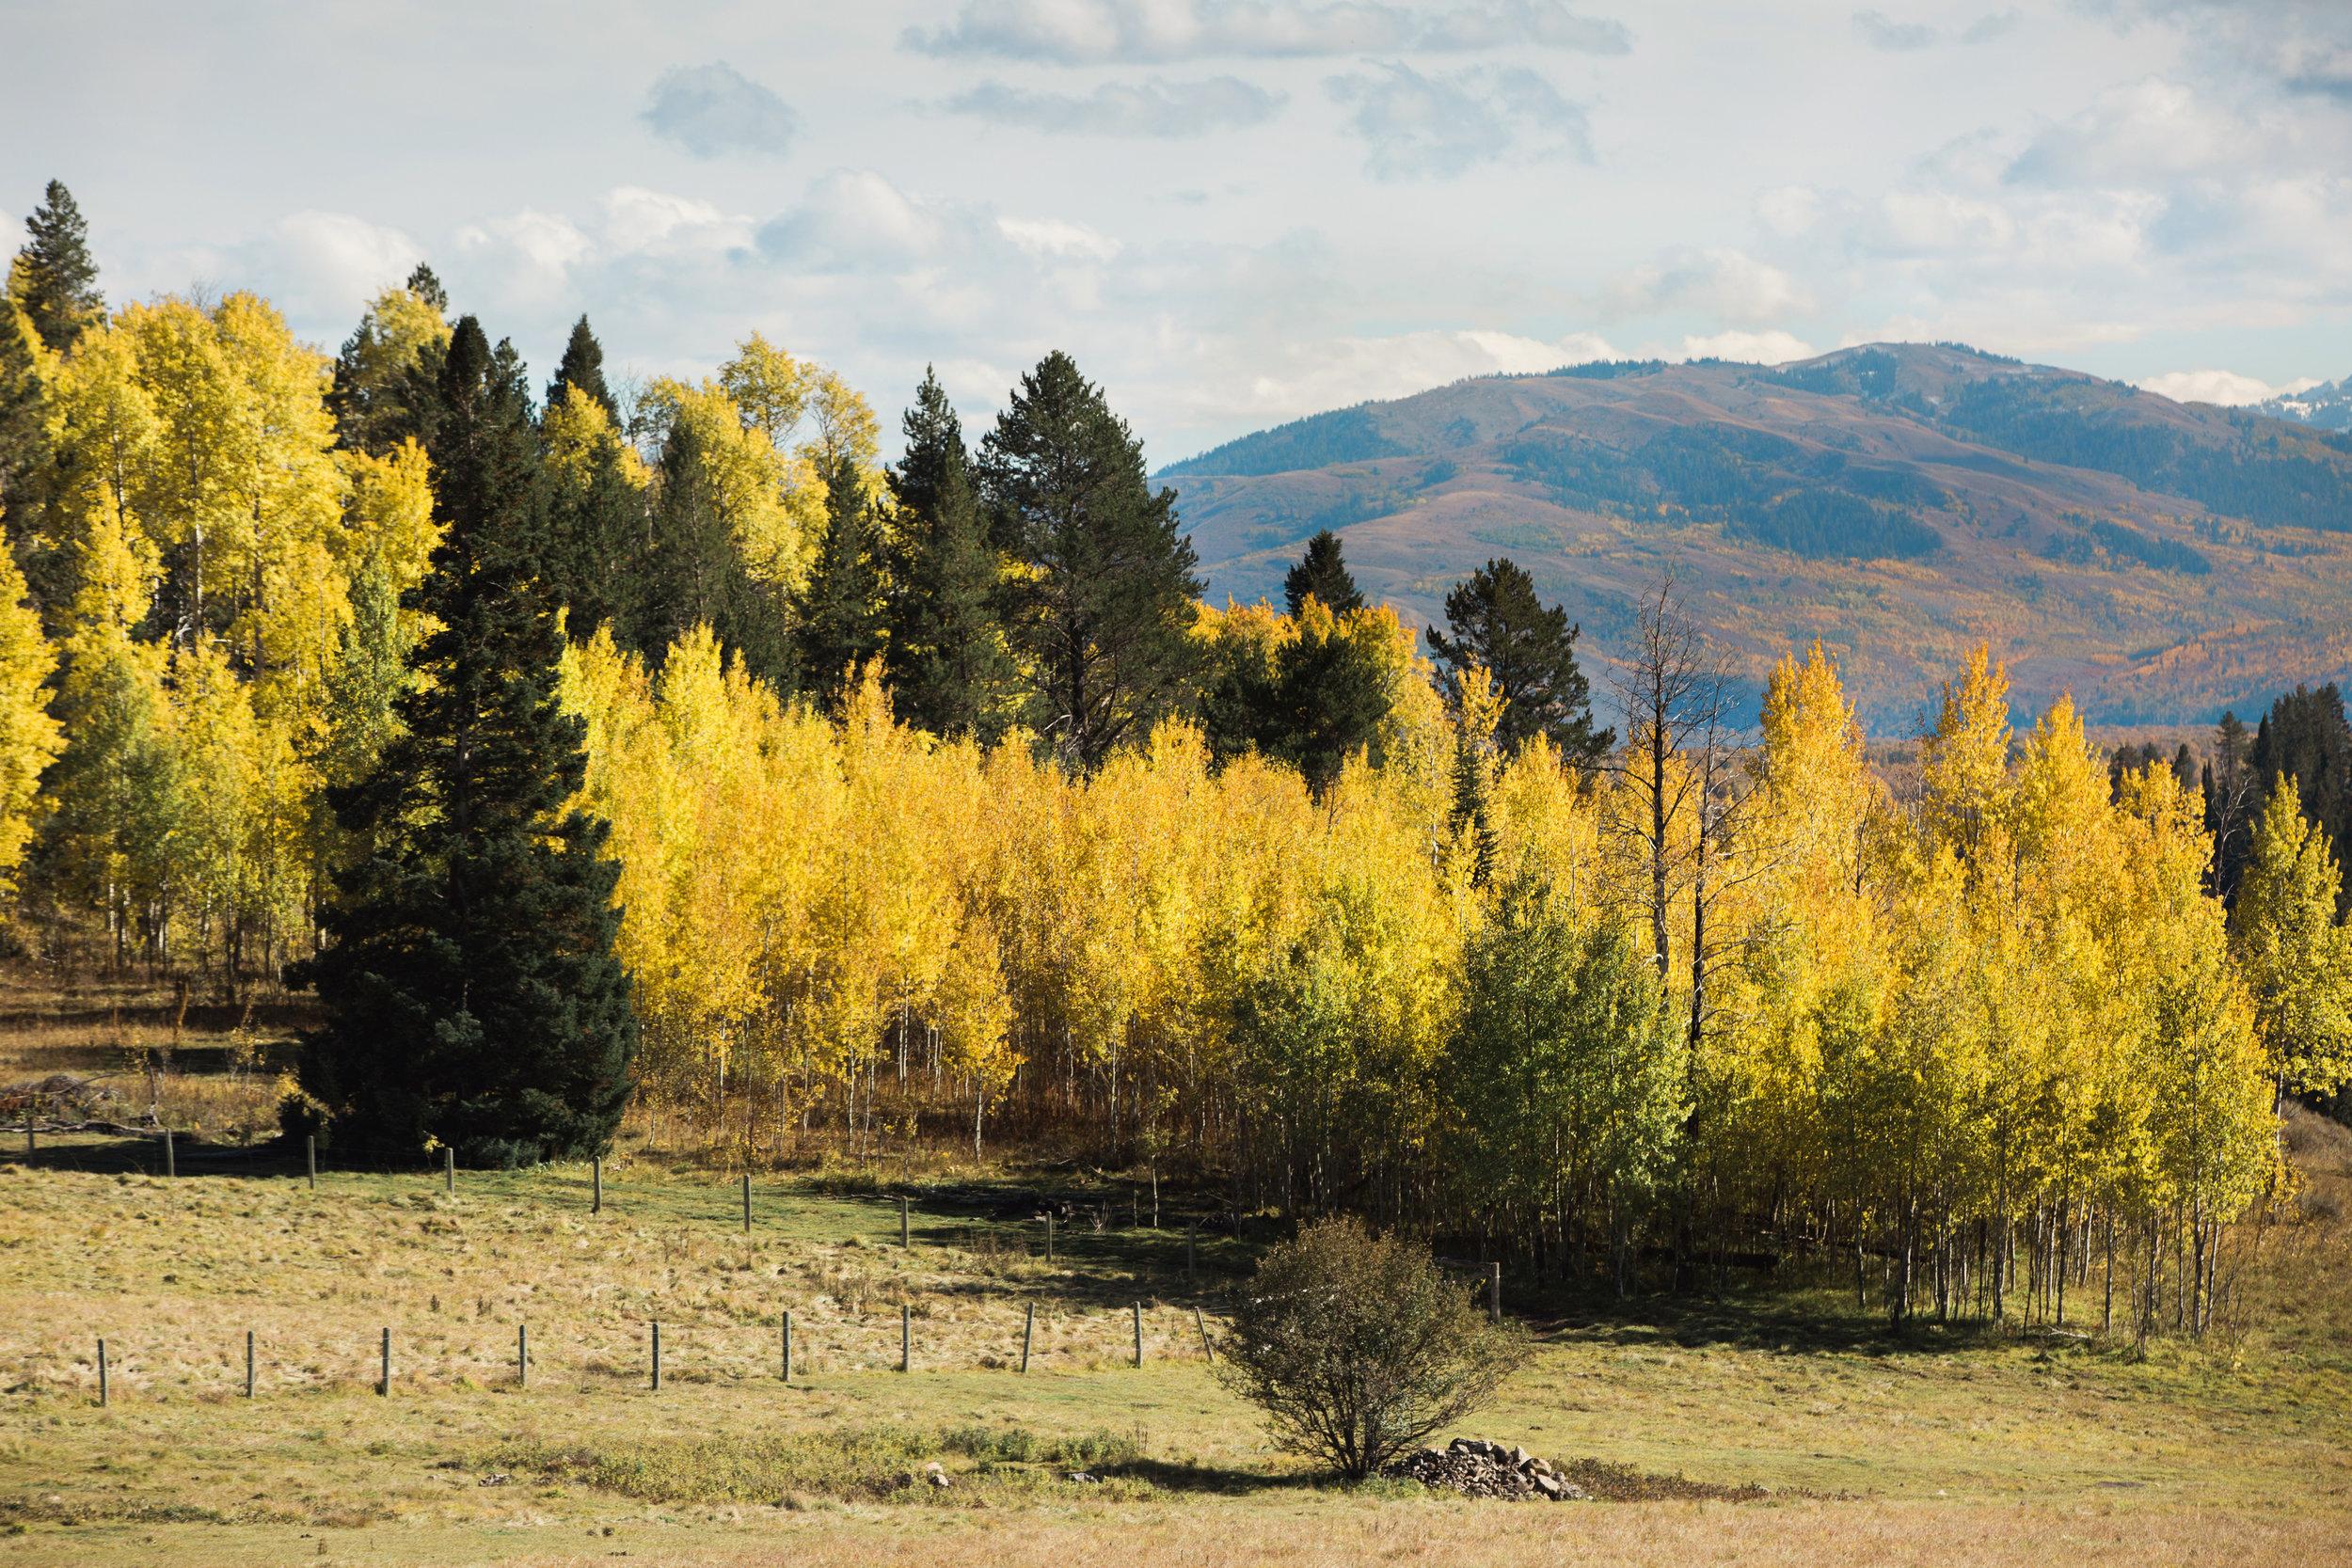 Cindy_Giovagnoli_Idaho_Wyoming_Grand_Teton_National_Park_autumn_aspens_camping_mountains-020.jpg